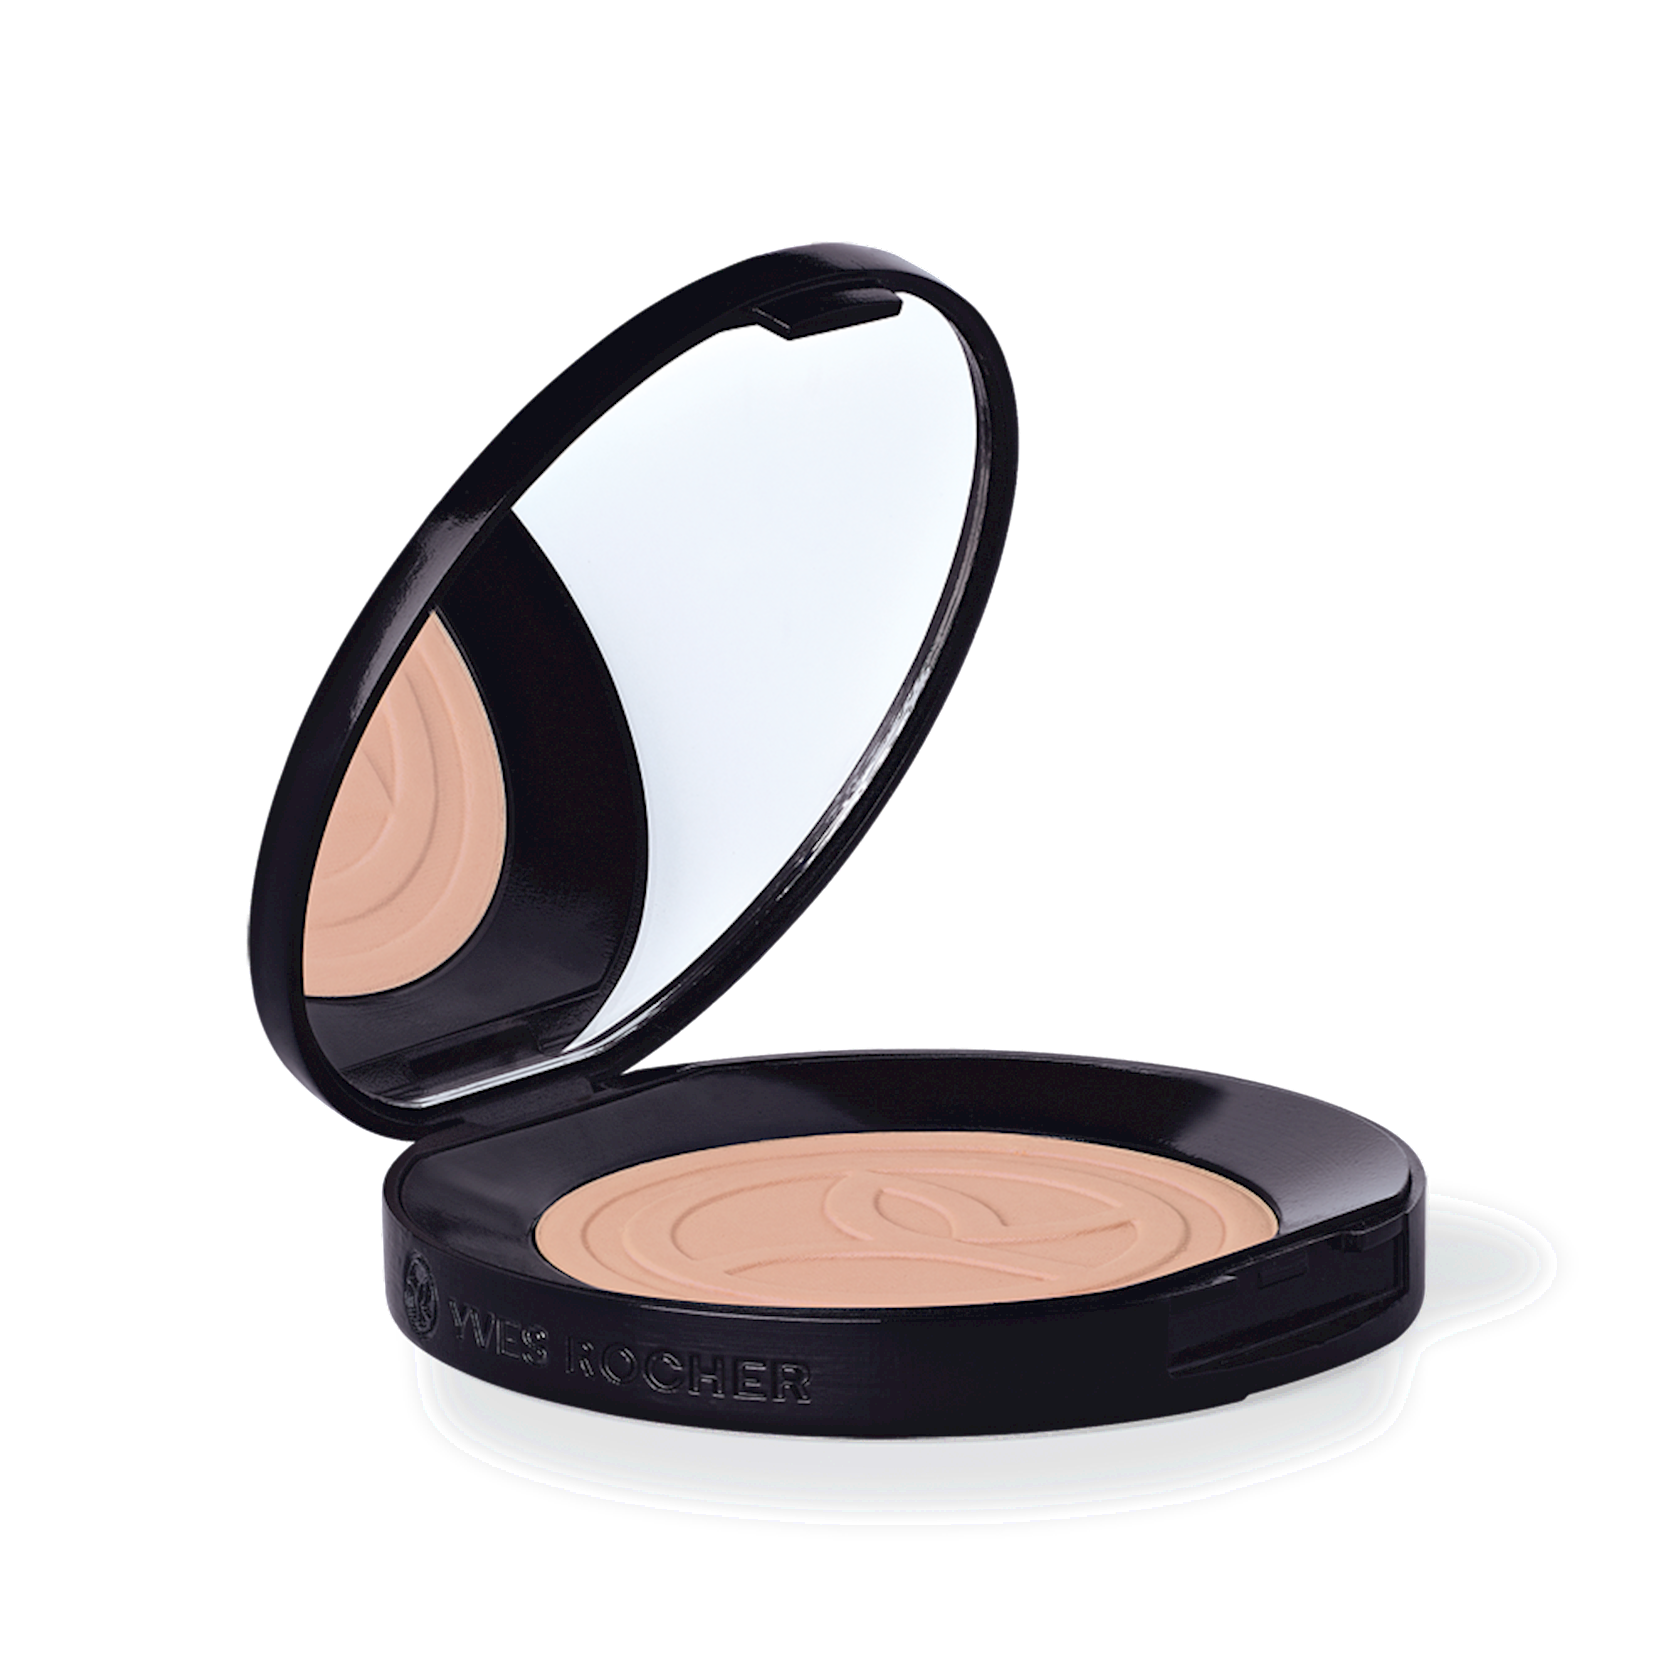 Kompakt kirşan Yves Rocher 10 g Pink-Cream